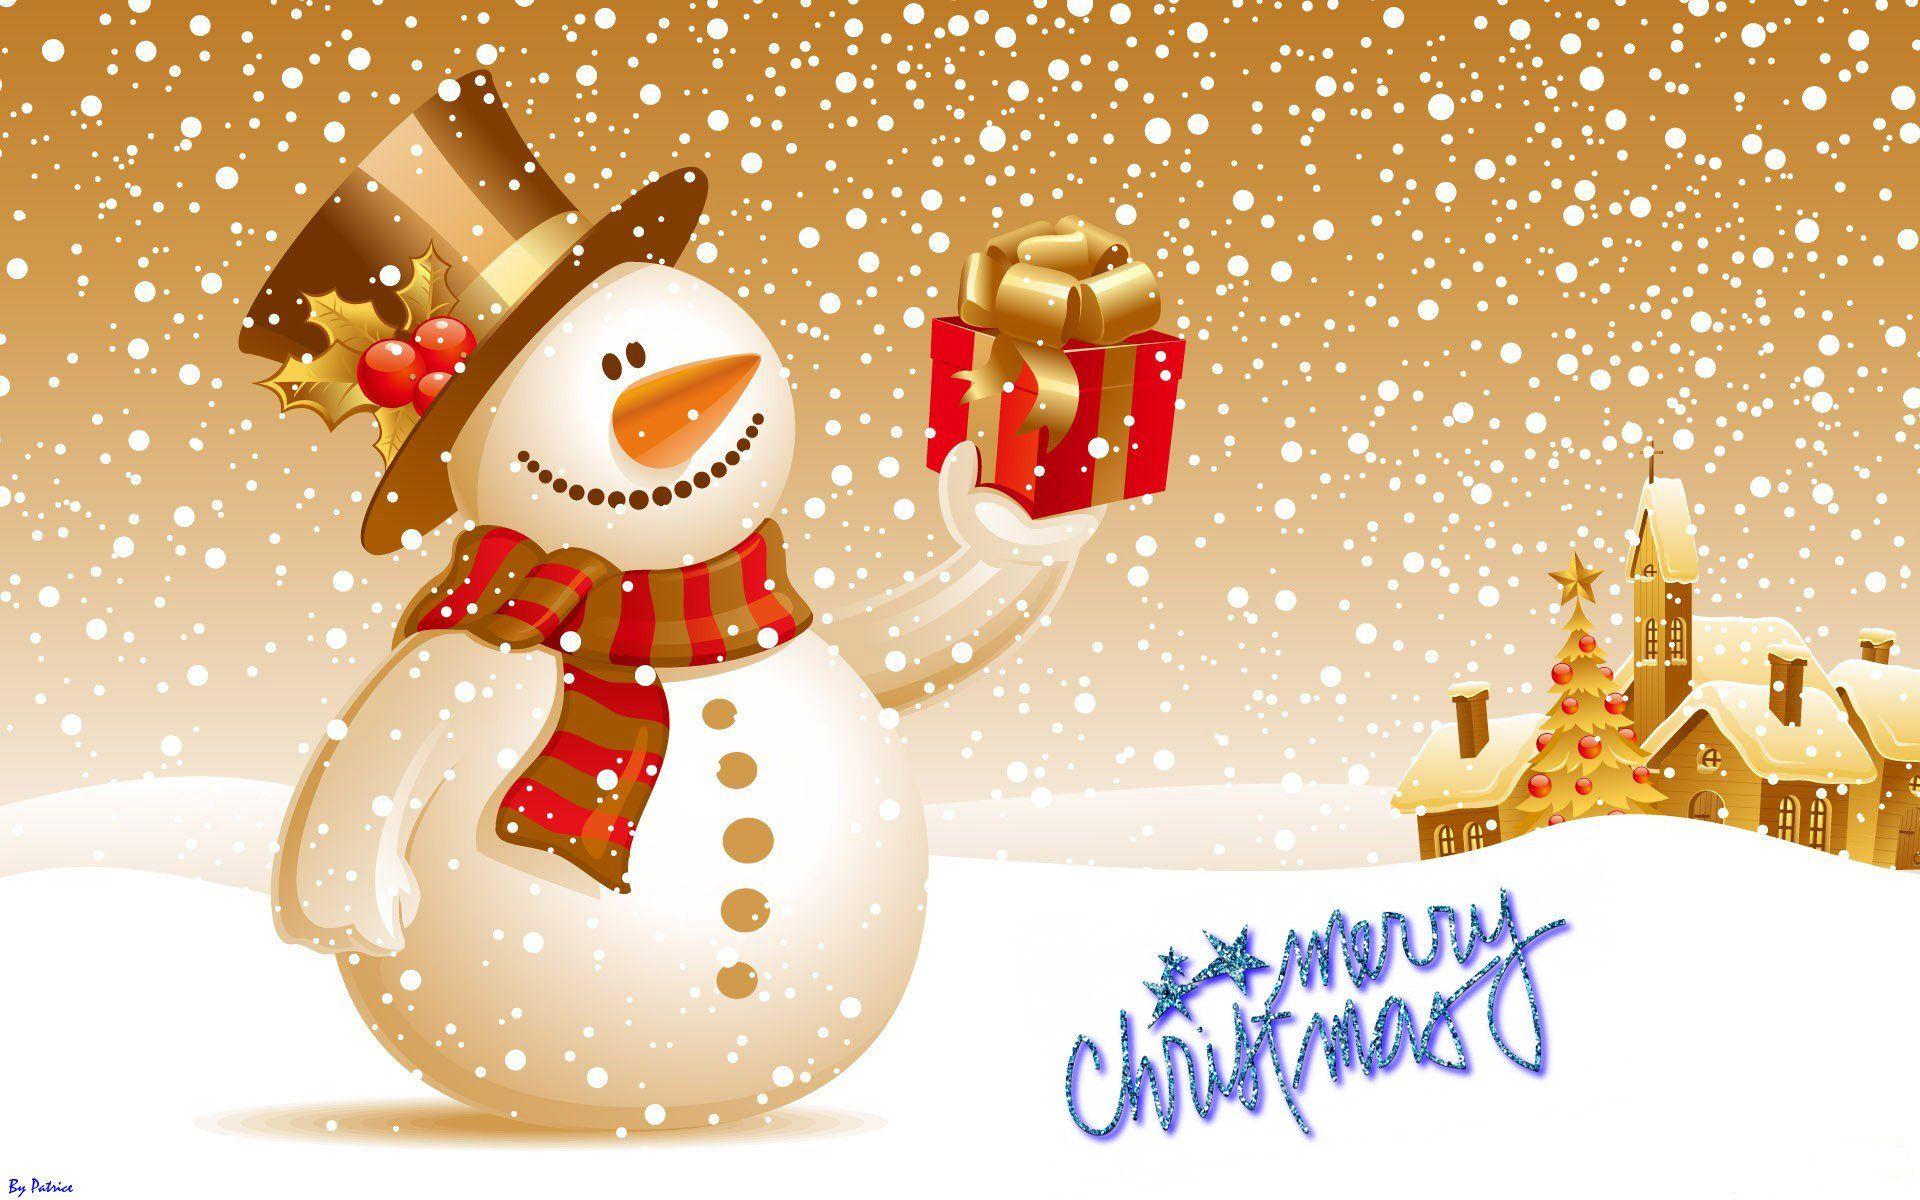 Pin von Georgia Krstic auf Christmas! | Pinterest